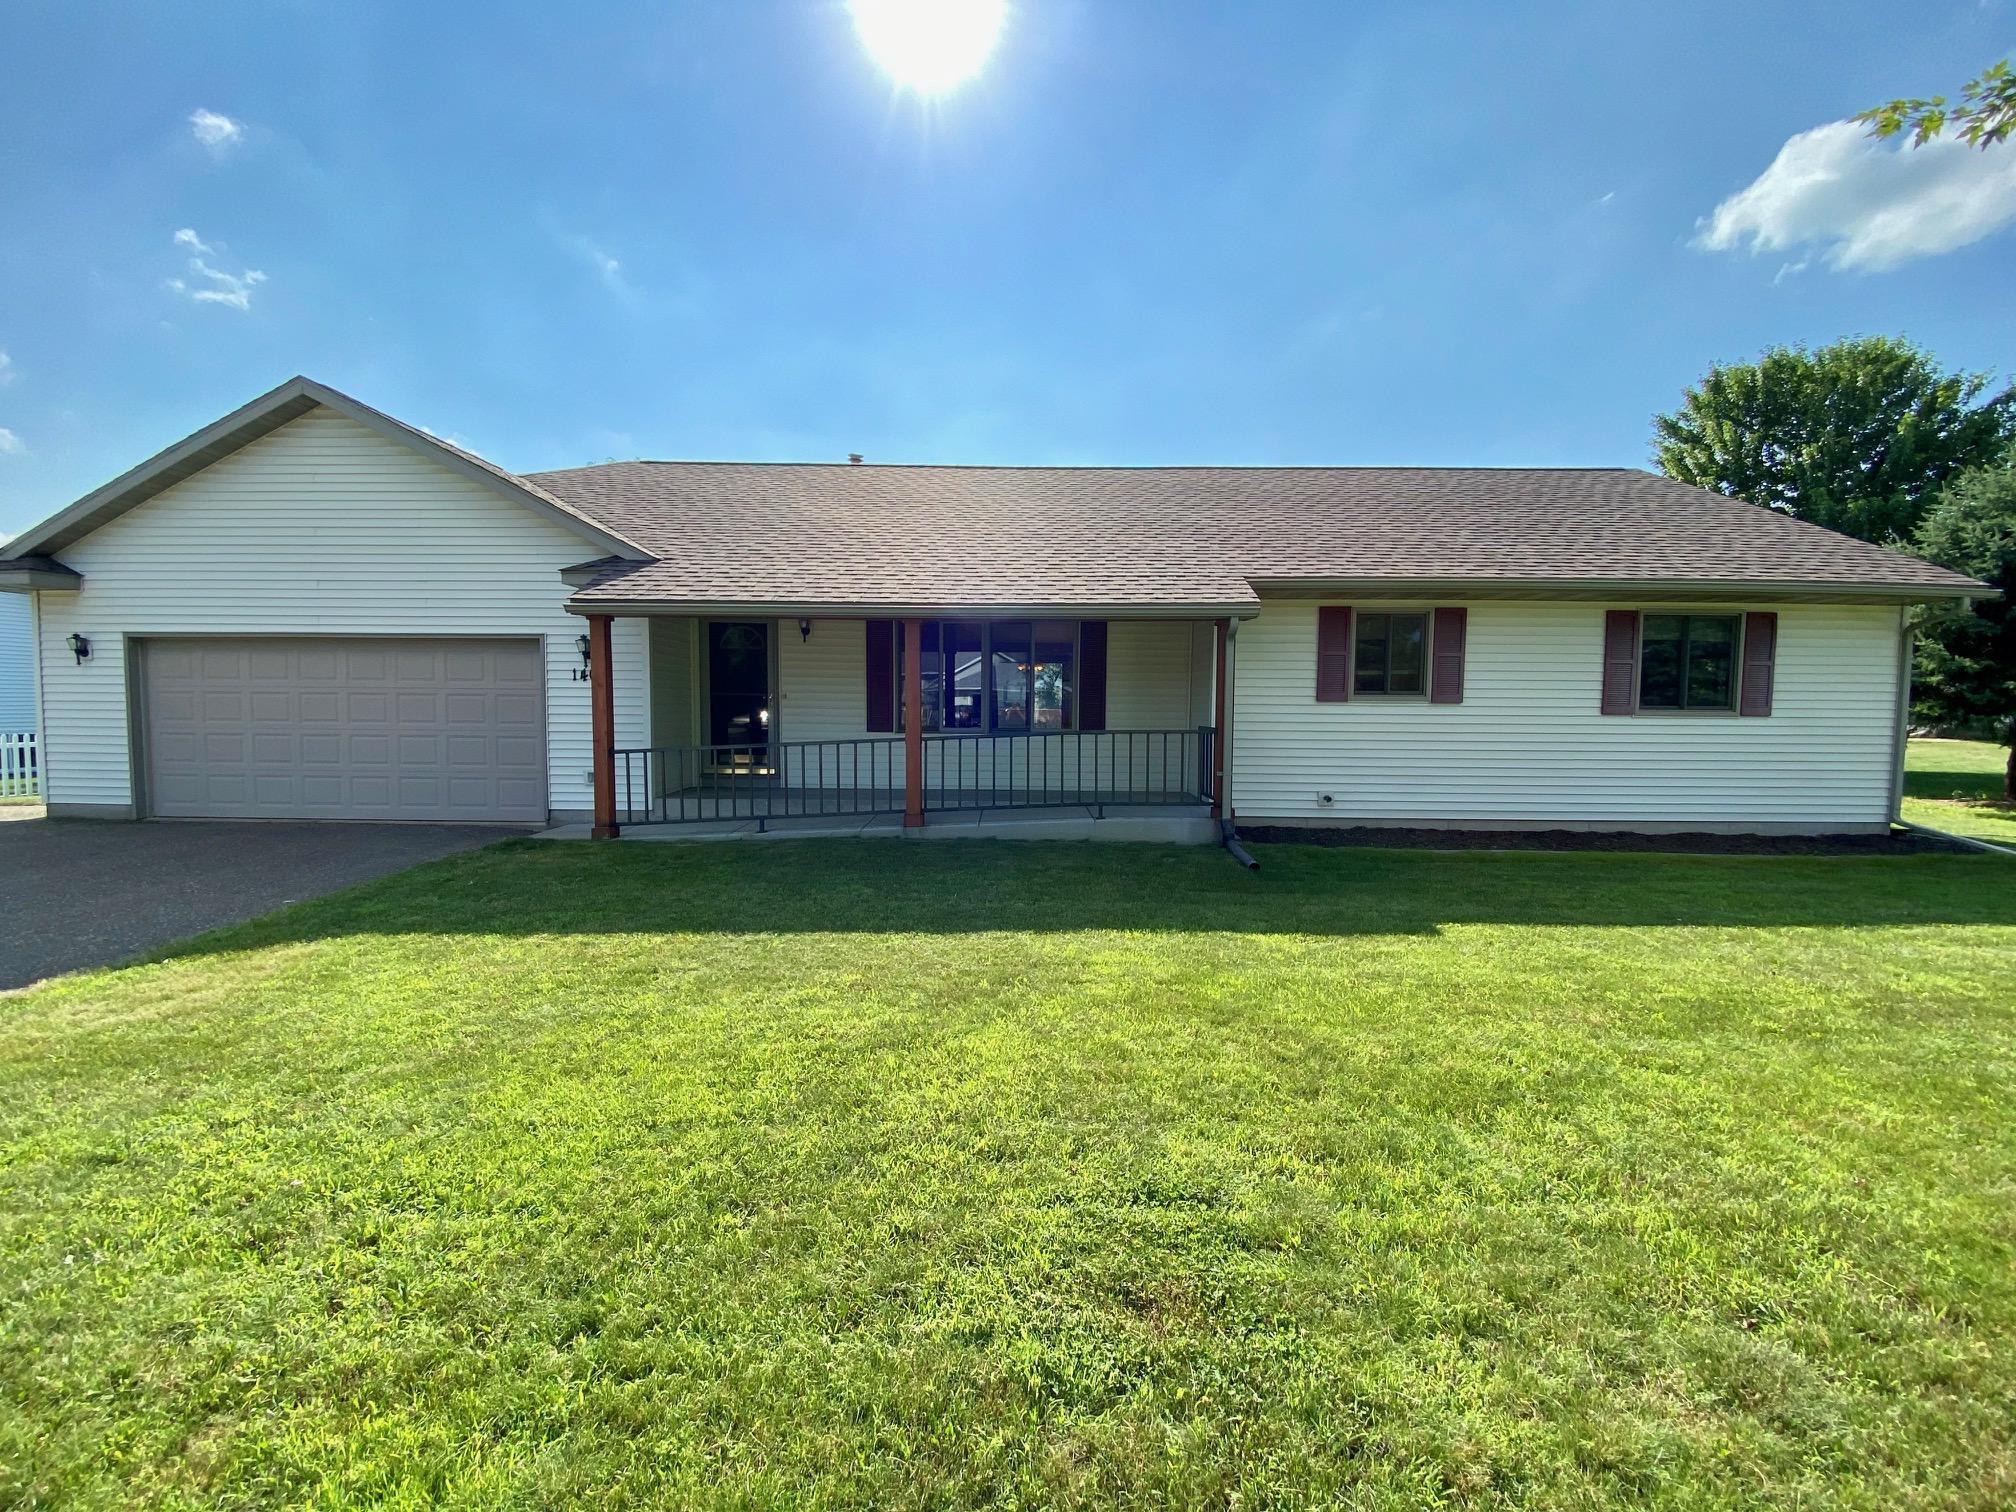 1408 Fox Run Property Photo - Chippewa Falls, WI real estate listing